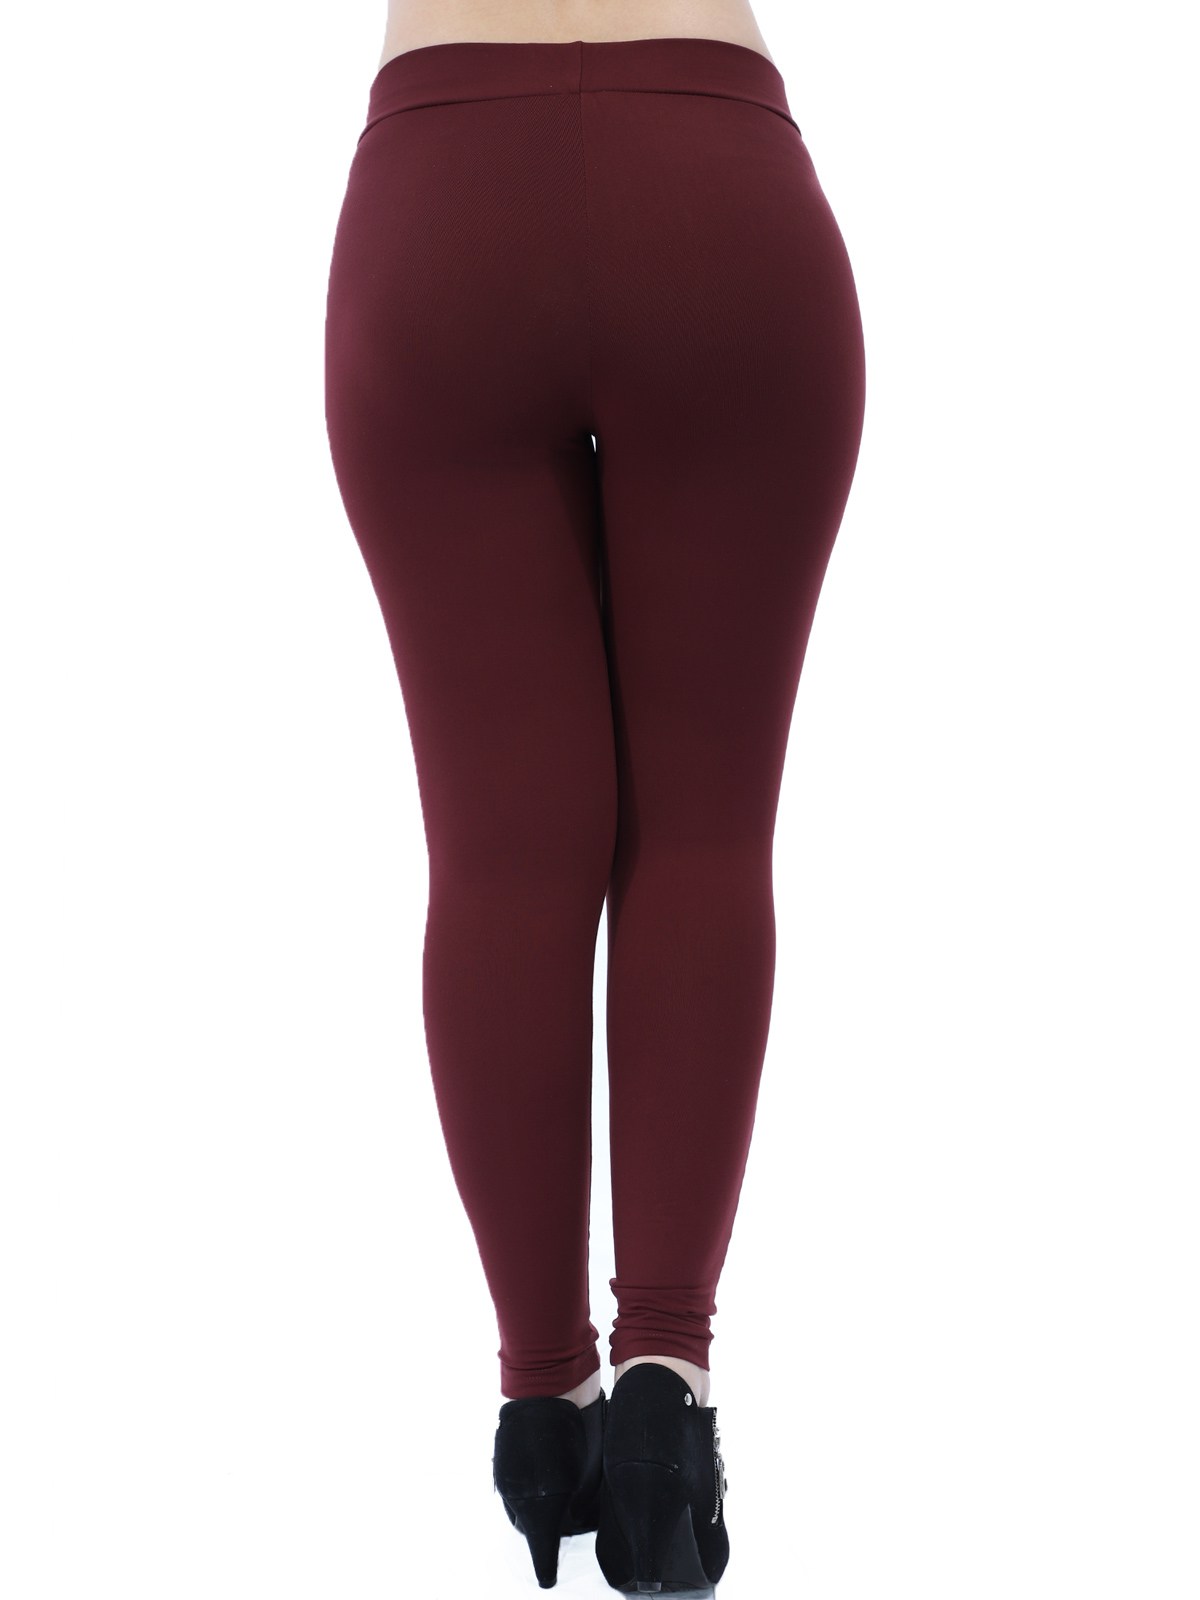 Calça Fusô Legging Fitness Feminina Academia Bordo